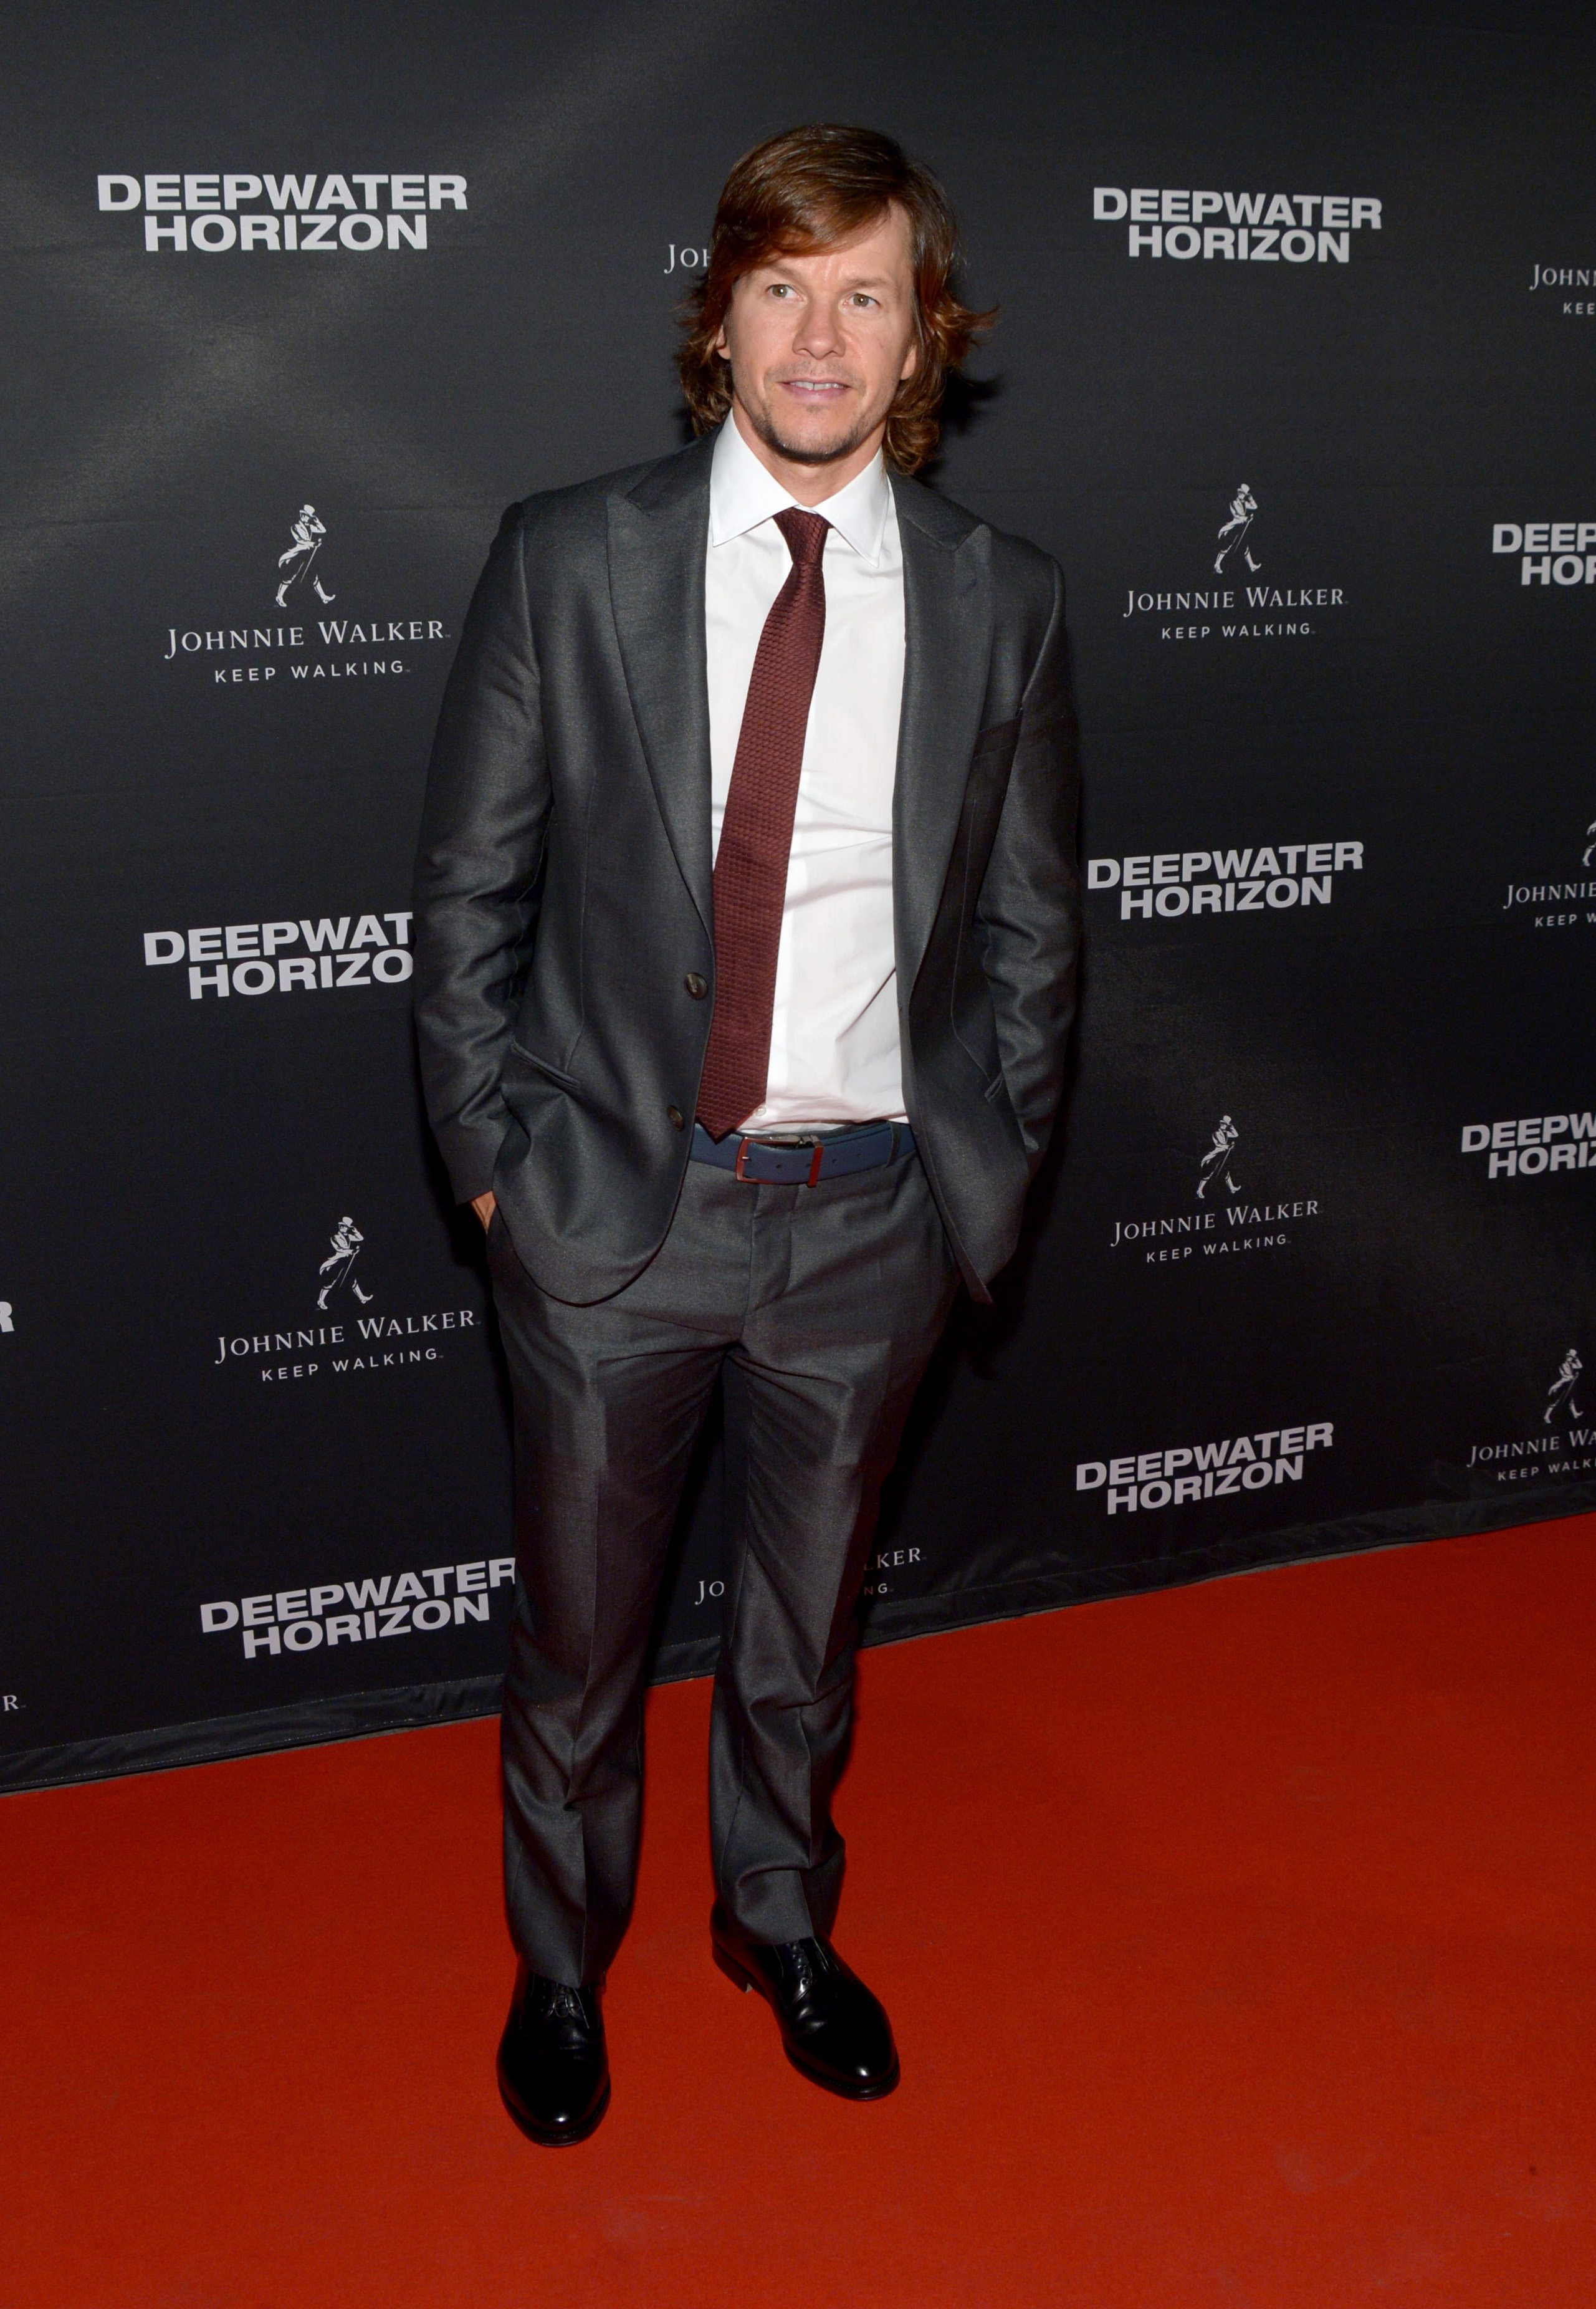 Johnnie Walker Presents Deepwater Horizon Premiere Screening Party in Toronto